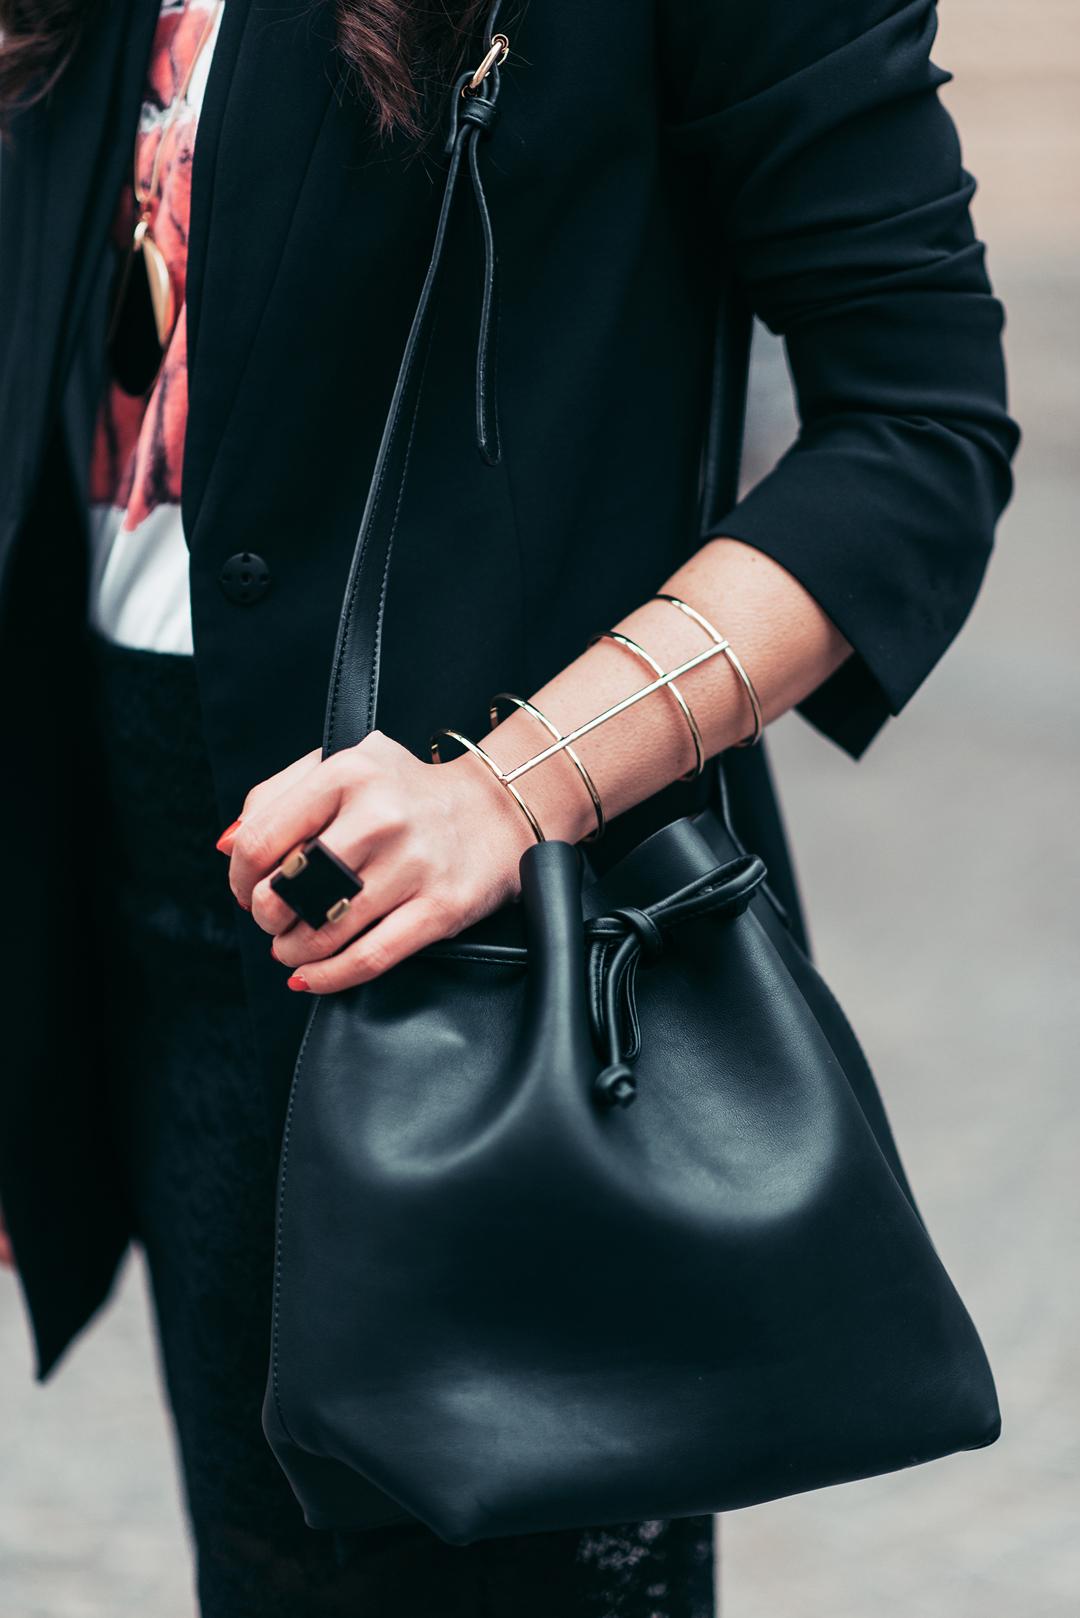 eva-ahacevcic_love-eva_ootd_six-accessories_zara-skirt_blazer_parfois-shoes_style_fashion-12